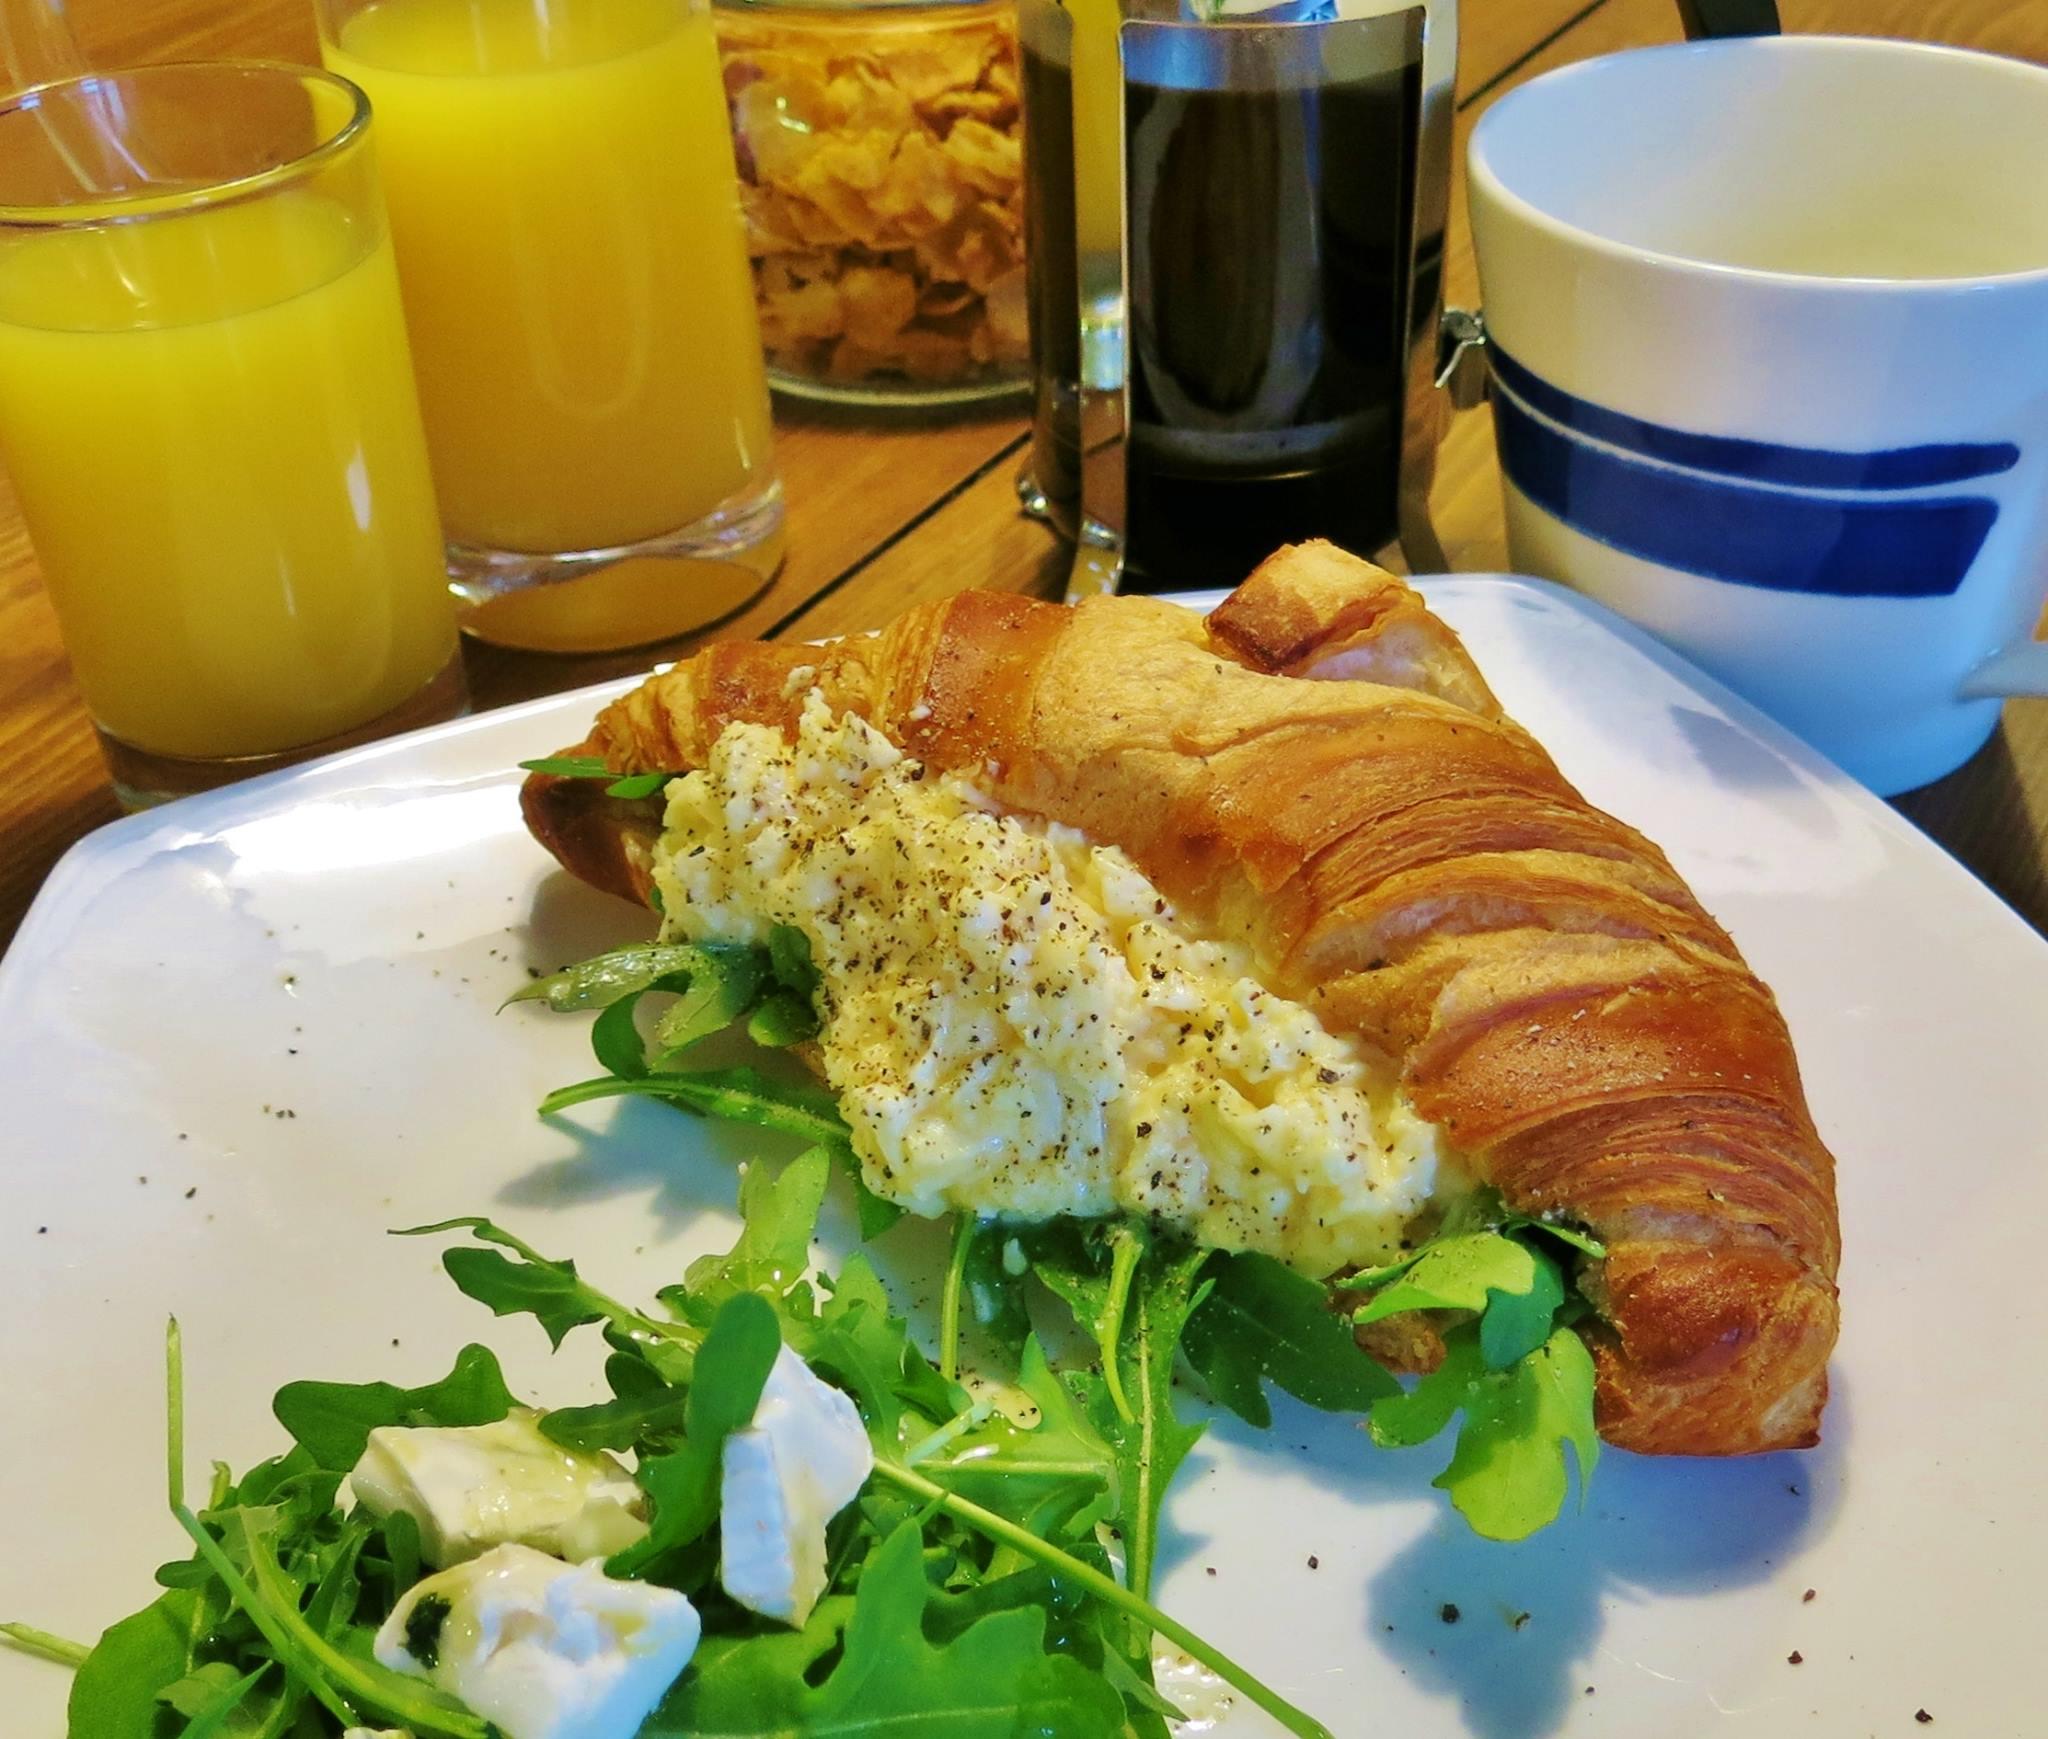 Fantastic breakfast choices!